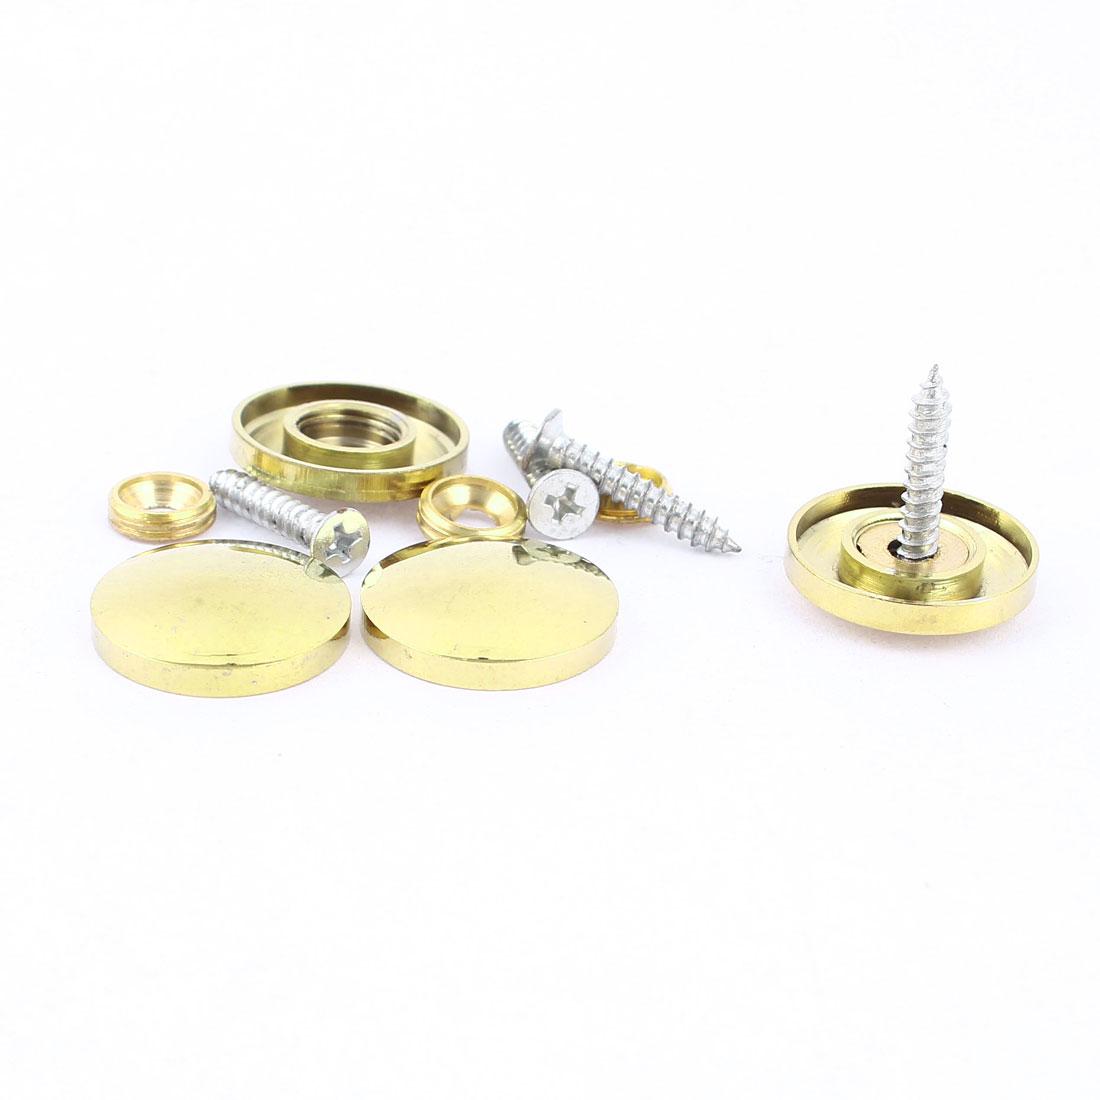 4 Pcs Fitting Parts Brass Tone 22mm Diameter Screw Cap Mirror Nails Decoration Lid